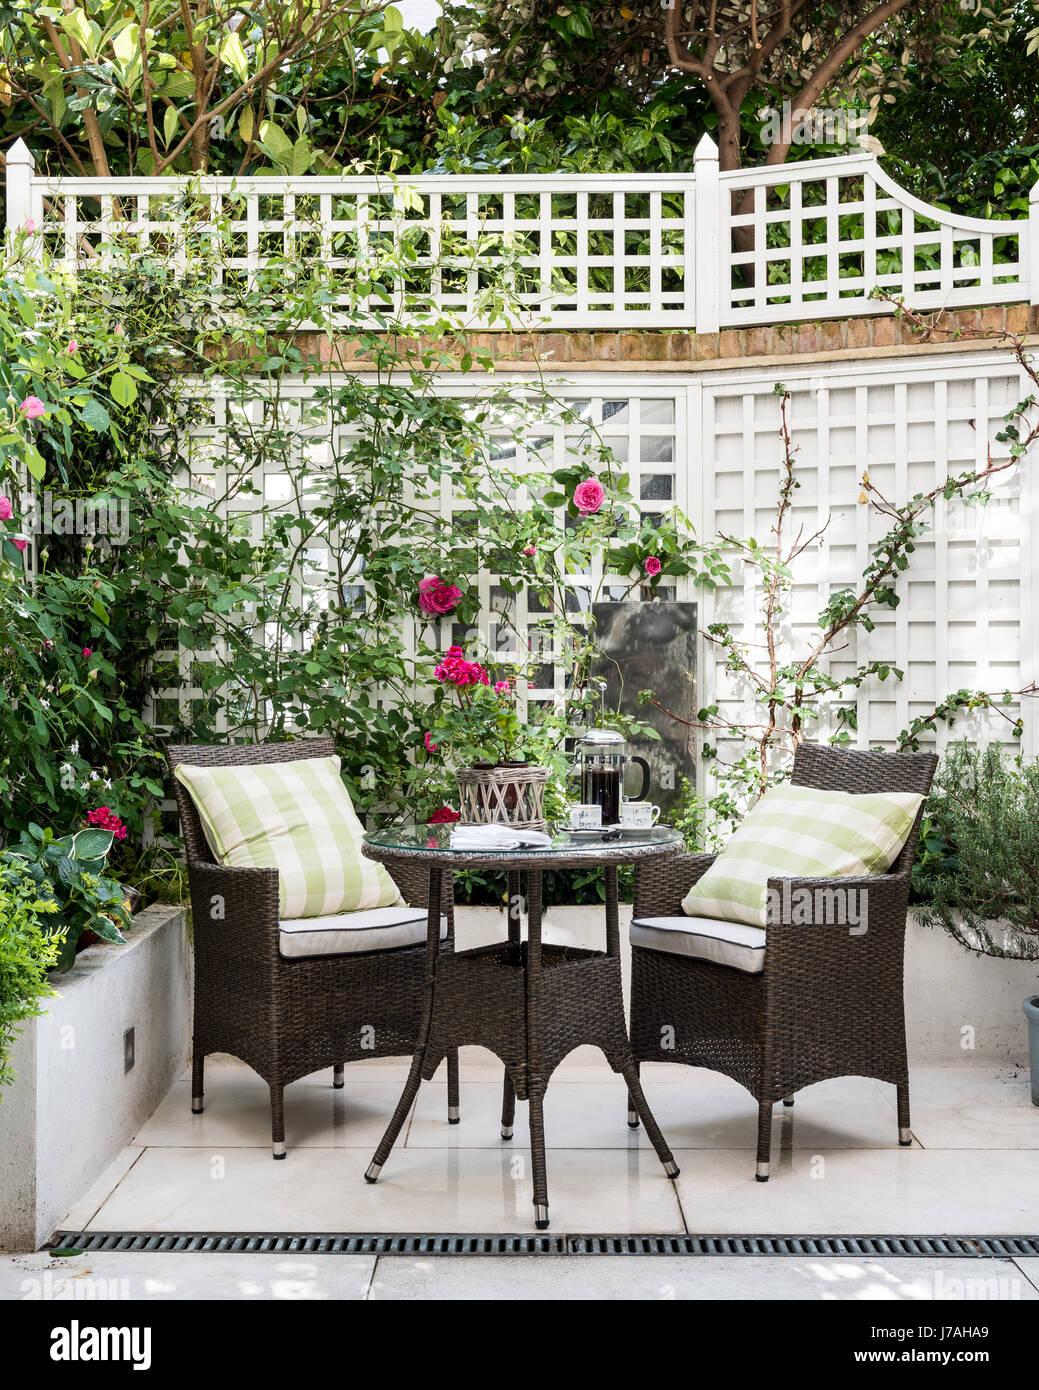 Wicker furniture in courtyard garden of Victorian terrace, London Stock Photo